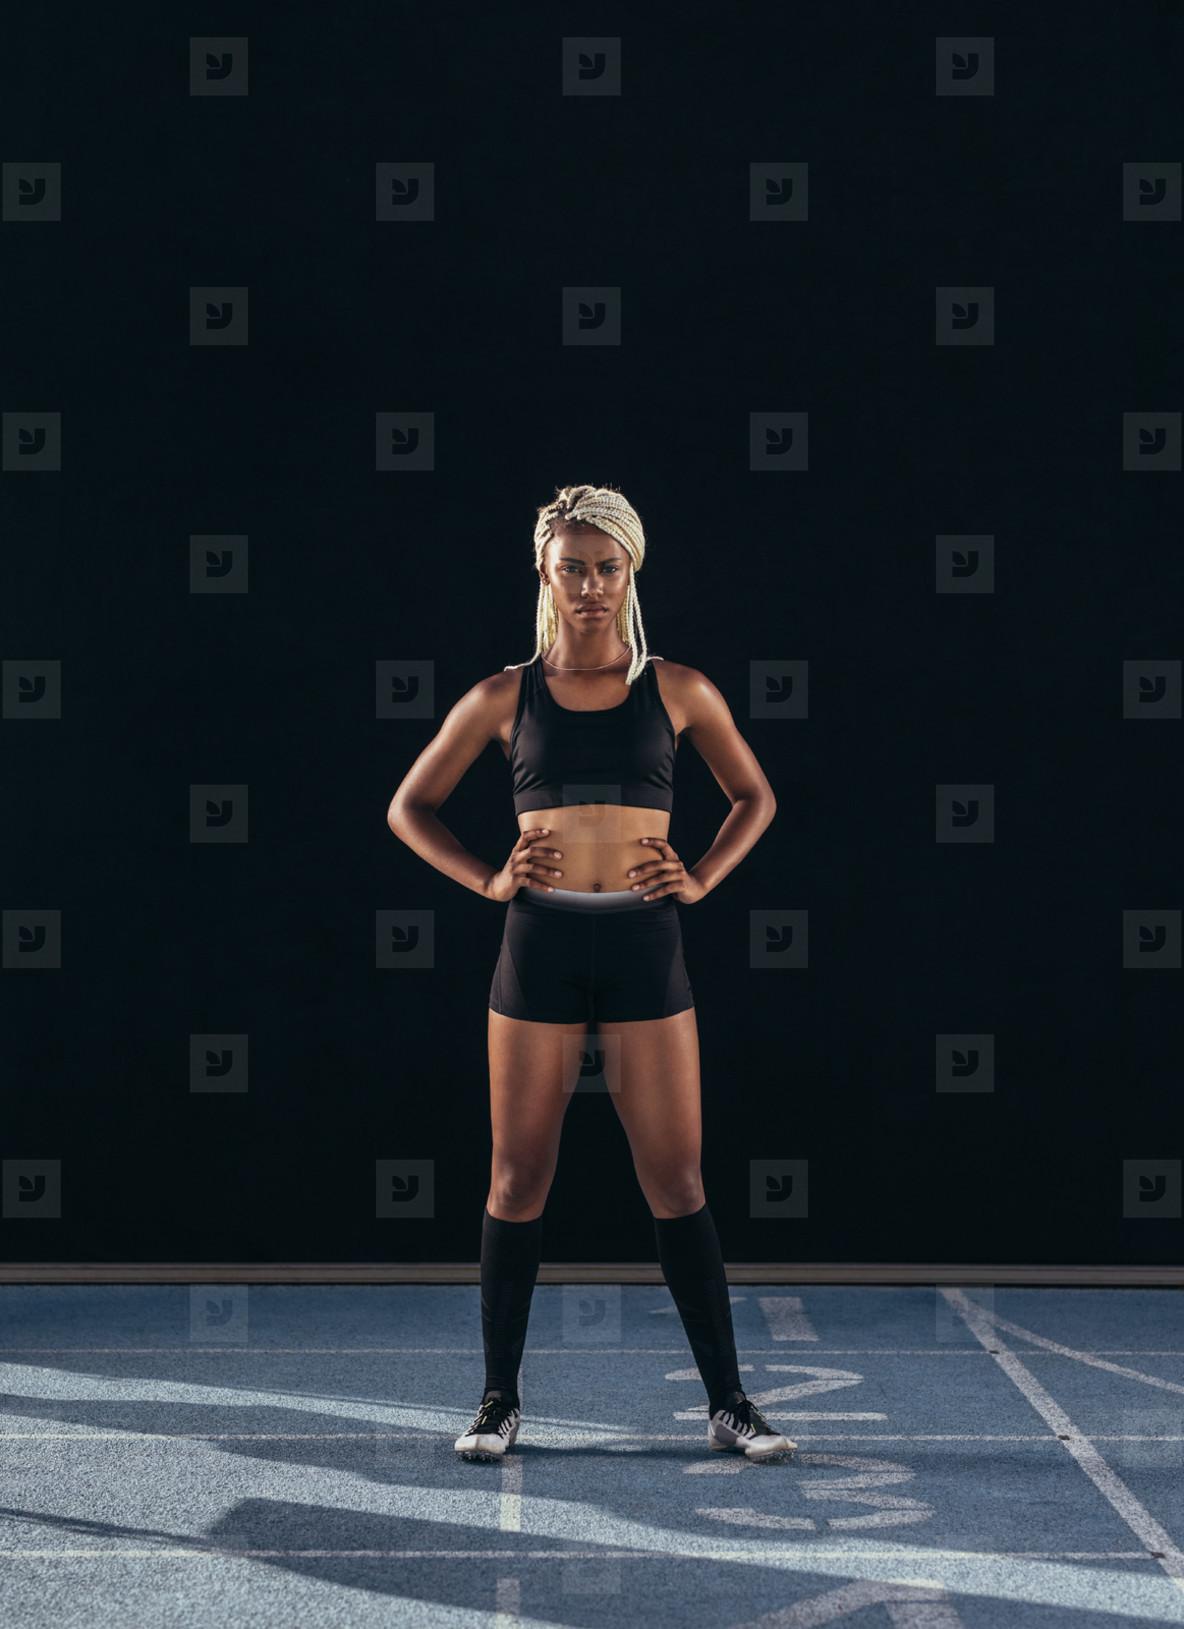 Female sprinter standing on a running track